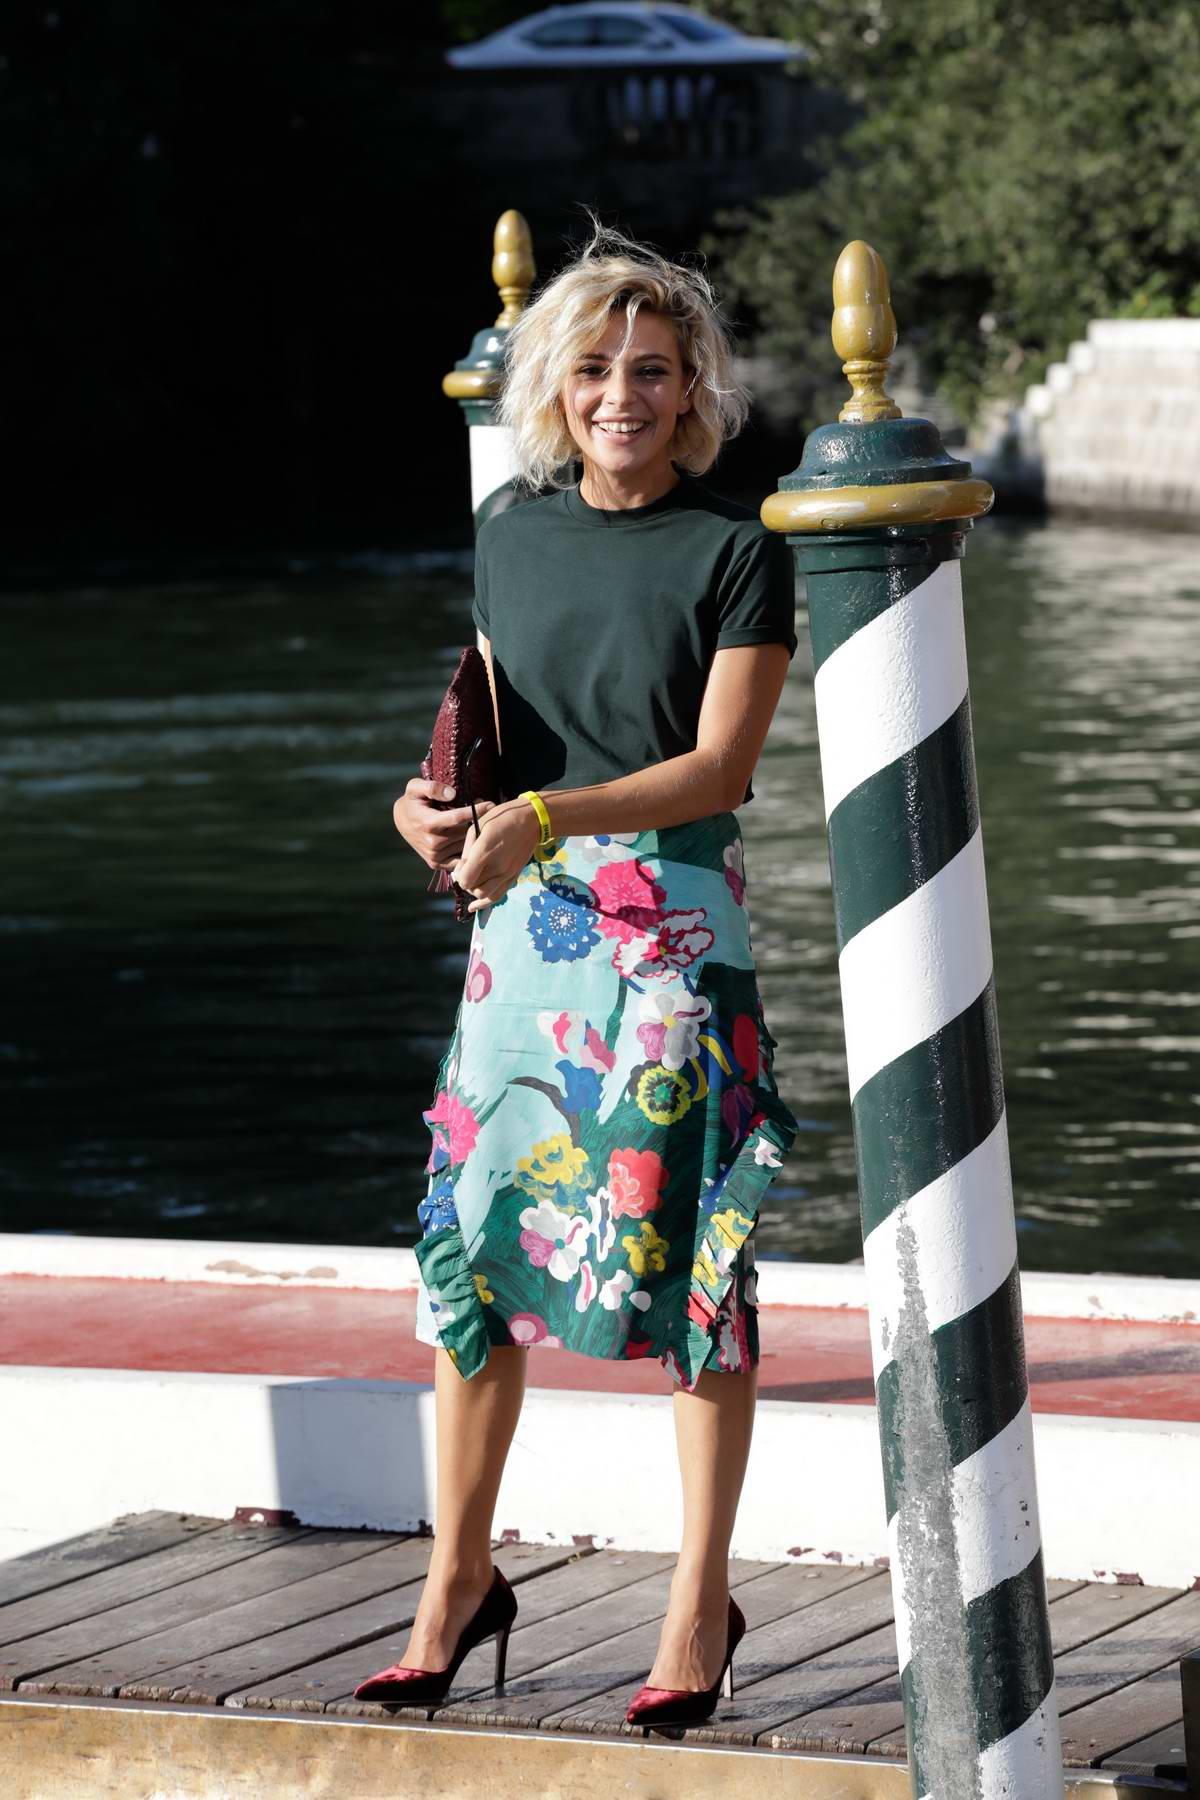 Jasmine Trinca arriving at Lido during 74th Venice Film Festival in Venice, Italy